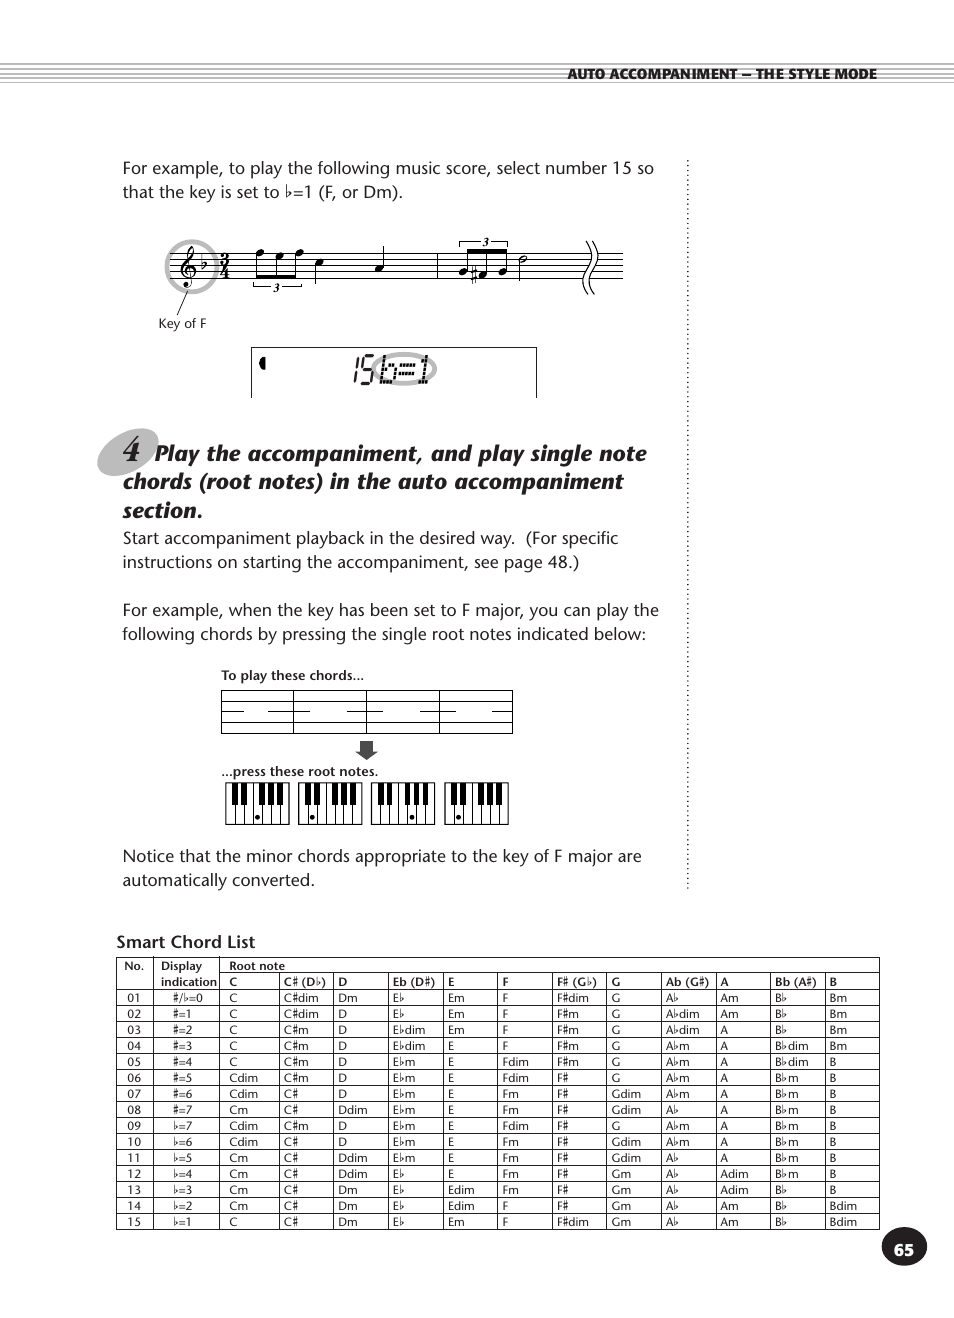 ... Array - smart chord list yamaha psr 270 user manual page 65 120 rh  manualsdir com